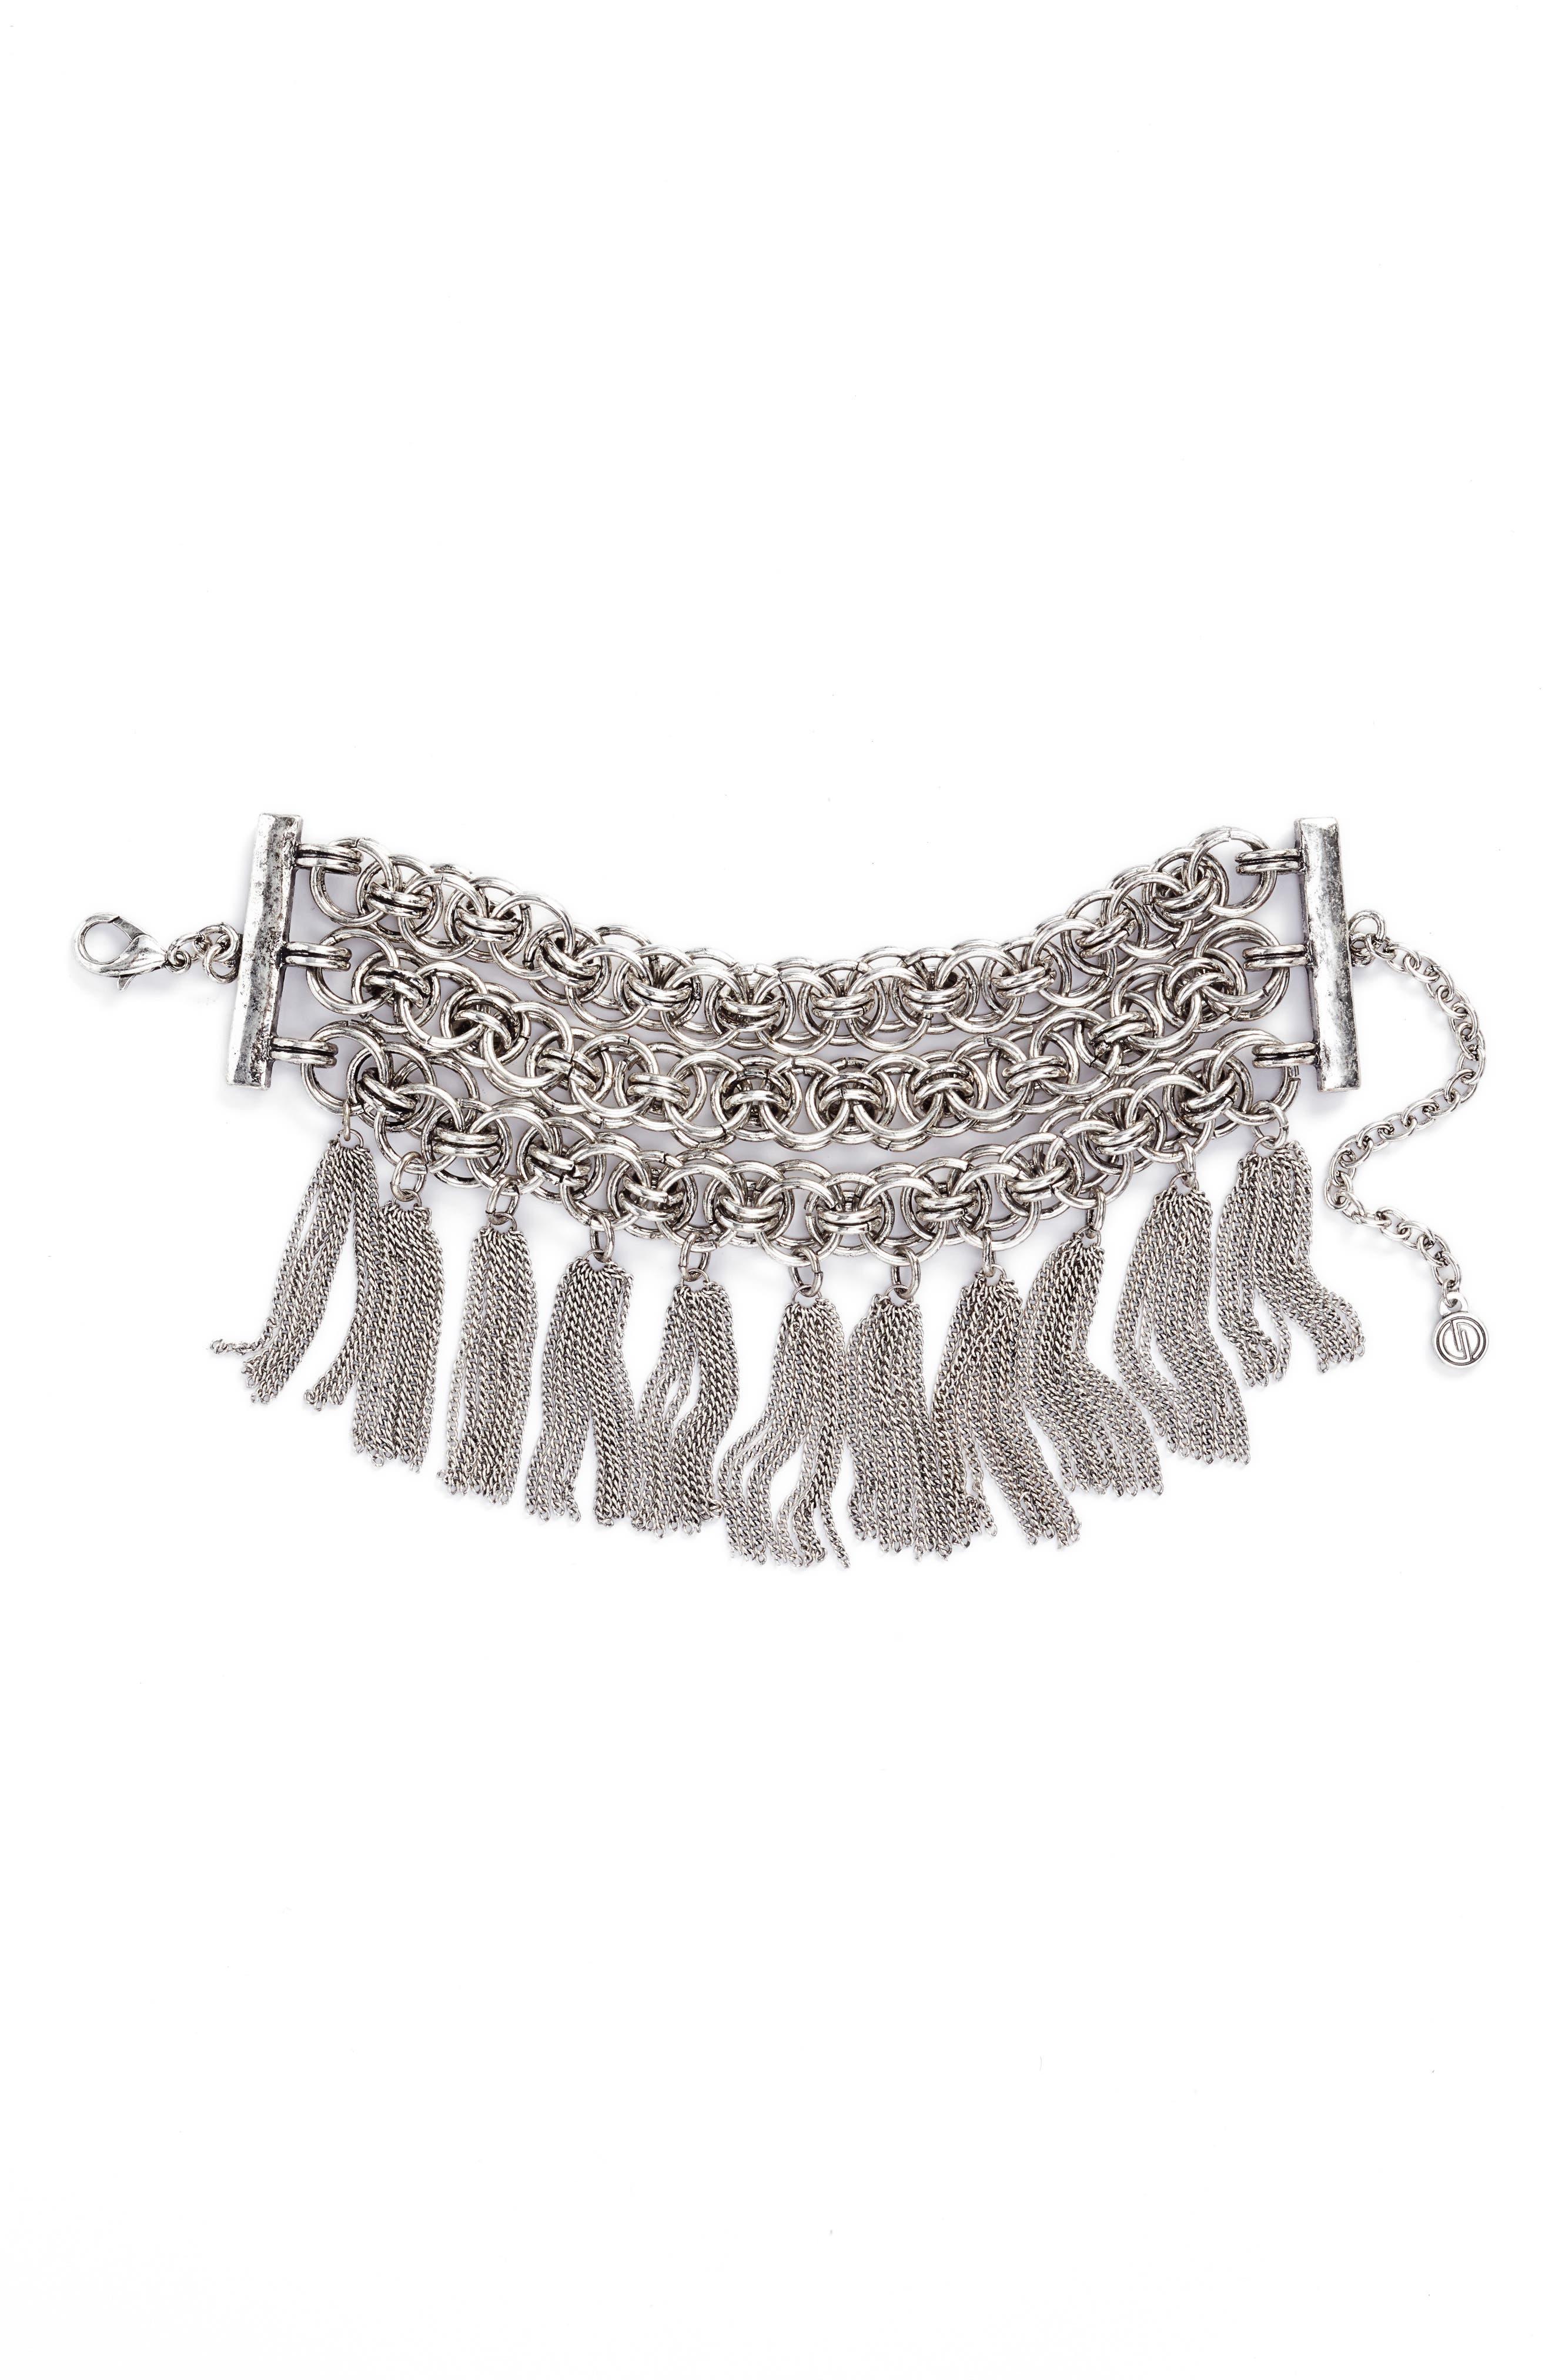 Main Image - DLNLX BY DYLANLEX Chain Bracelet